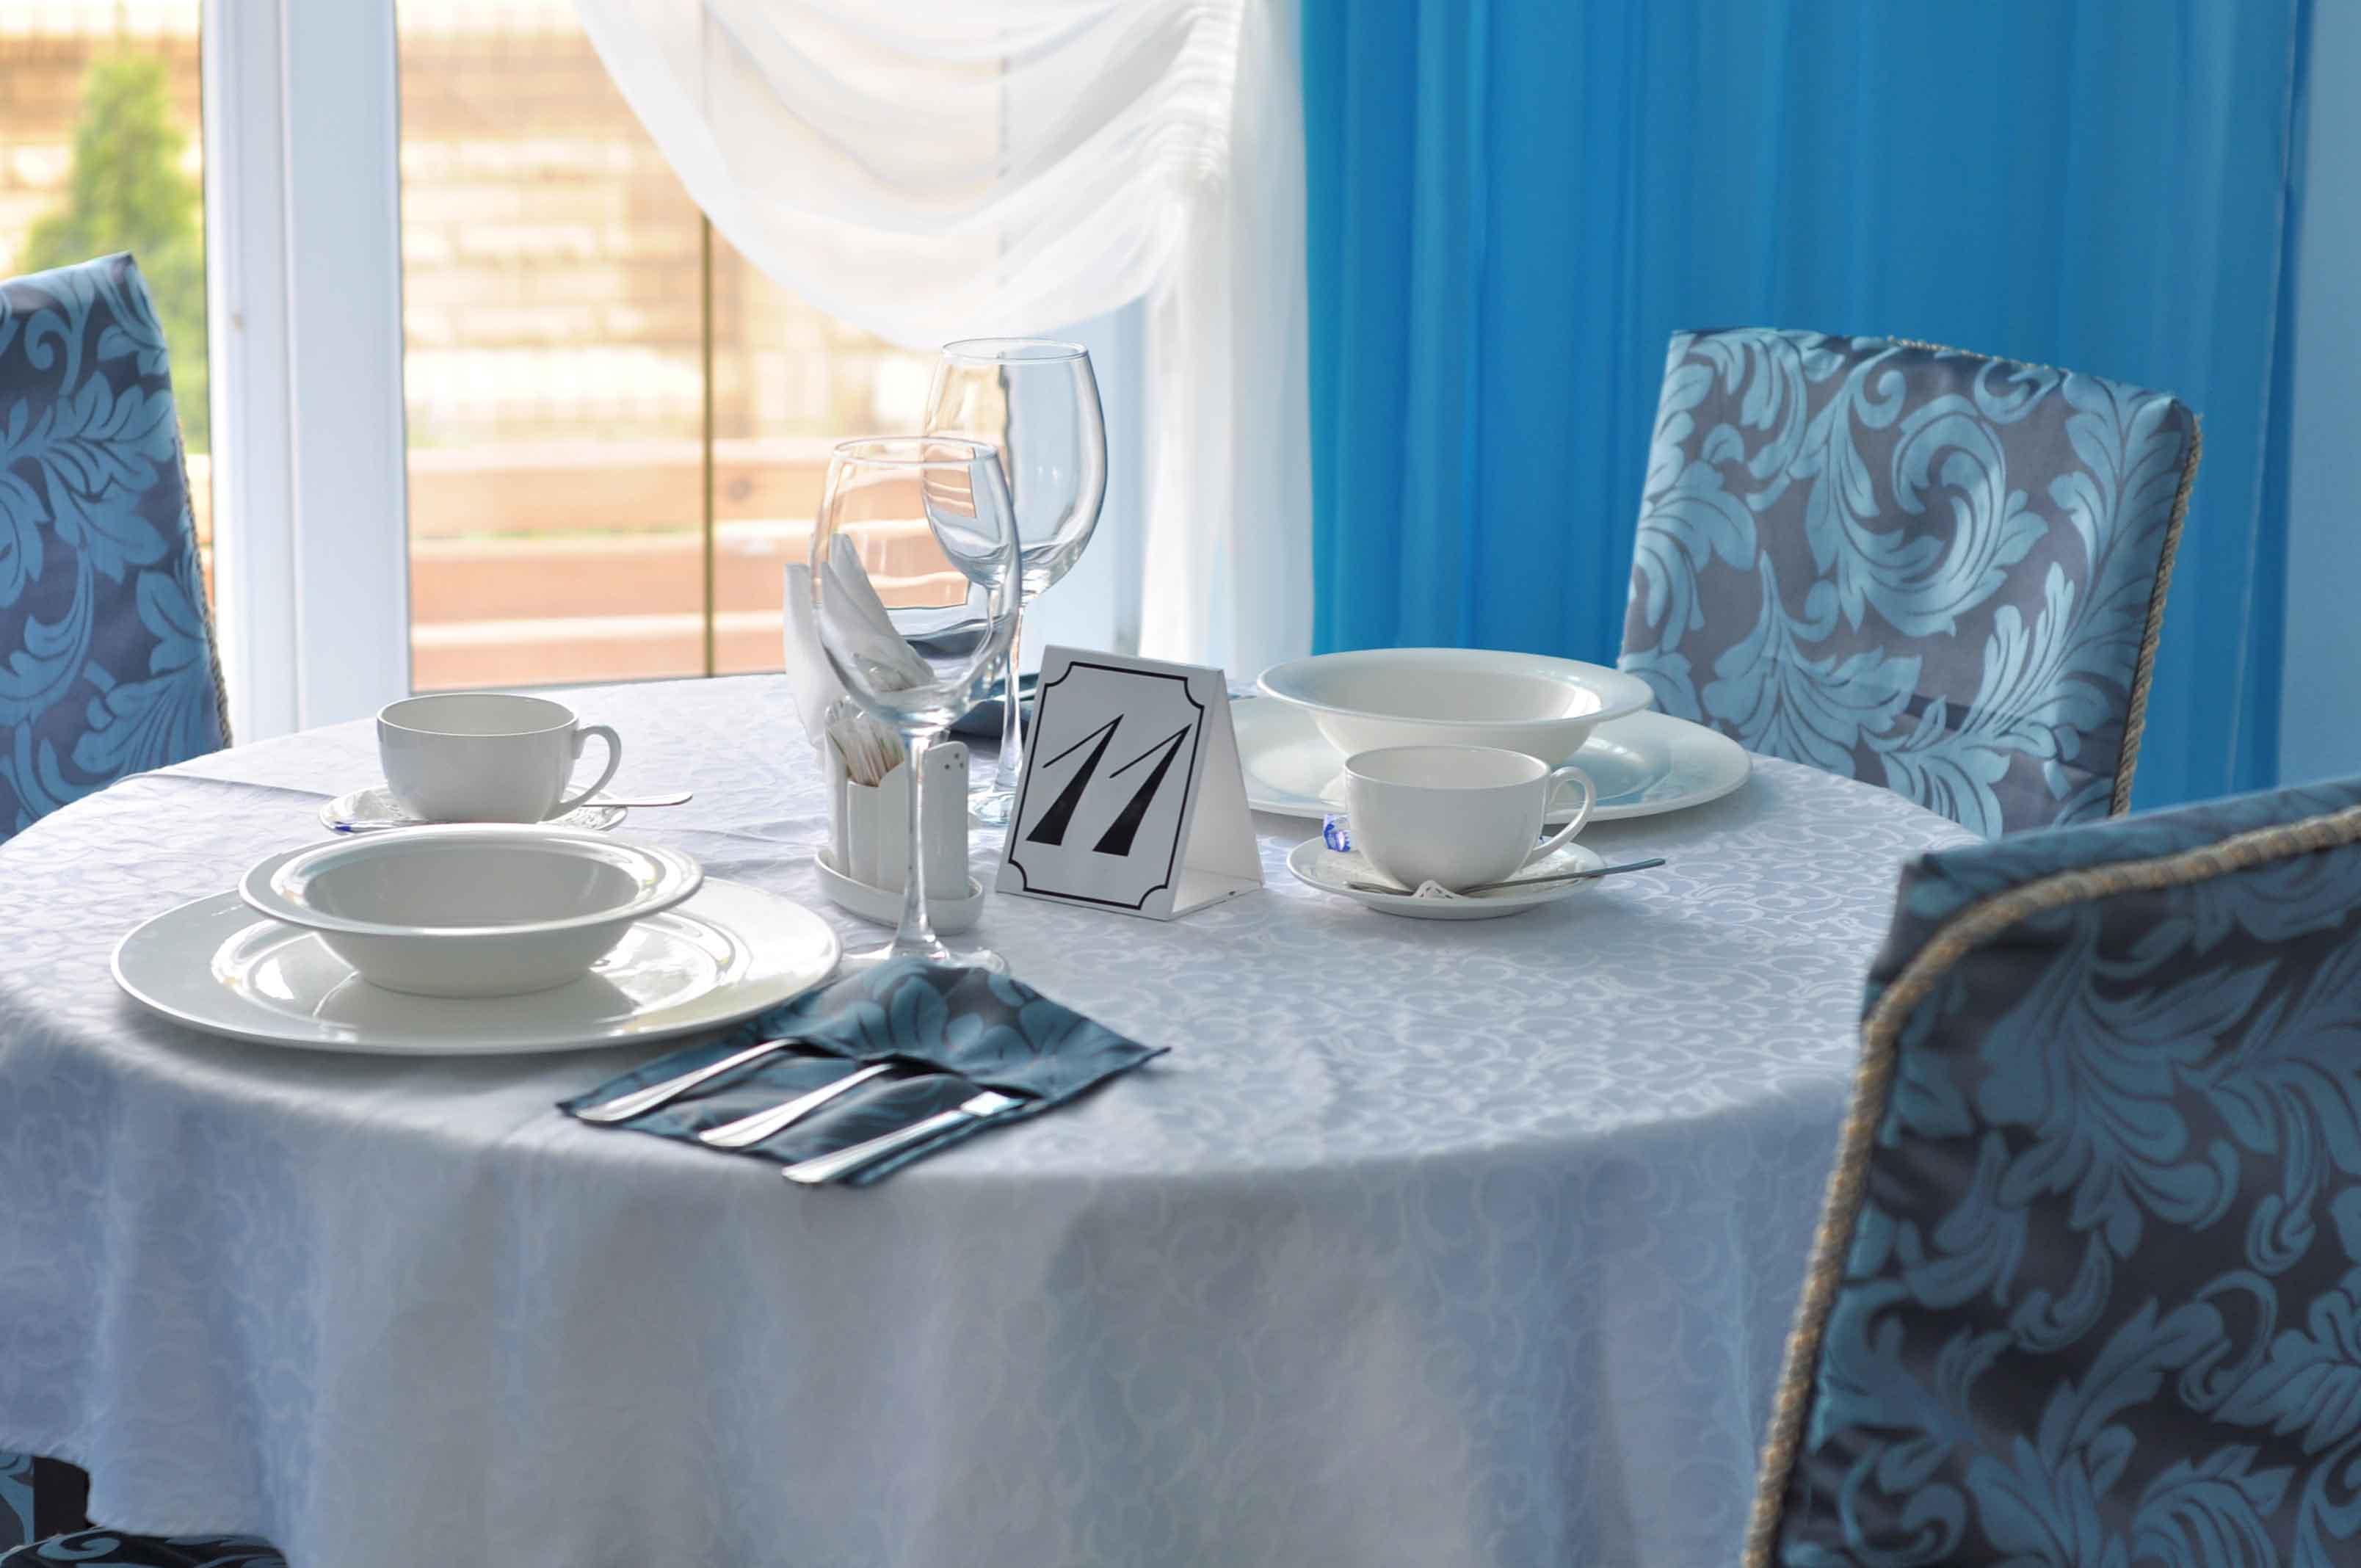 afina-hotel-restoran-berdjansk-1